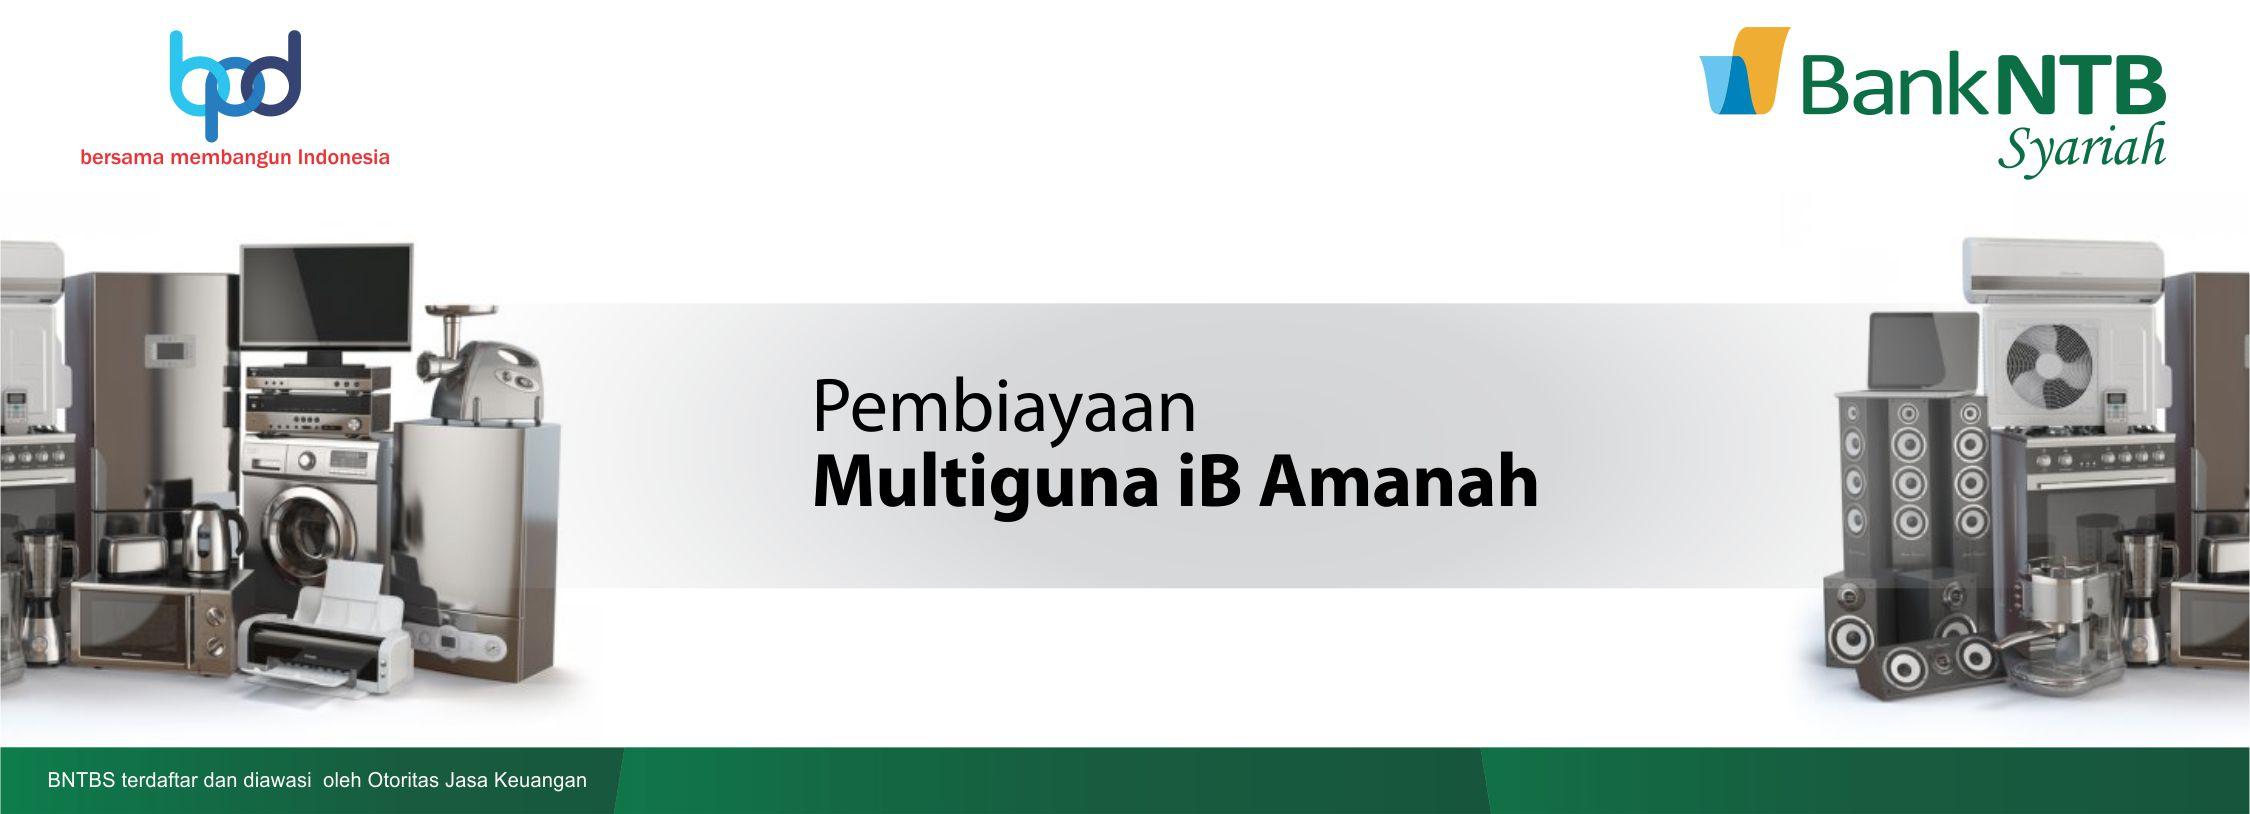 Multiguna iB Amanah